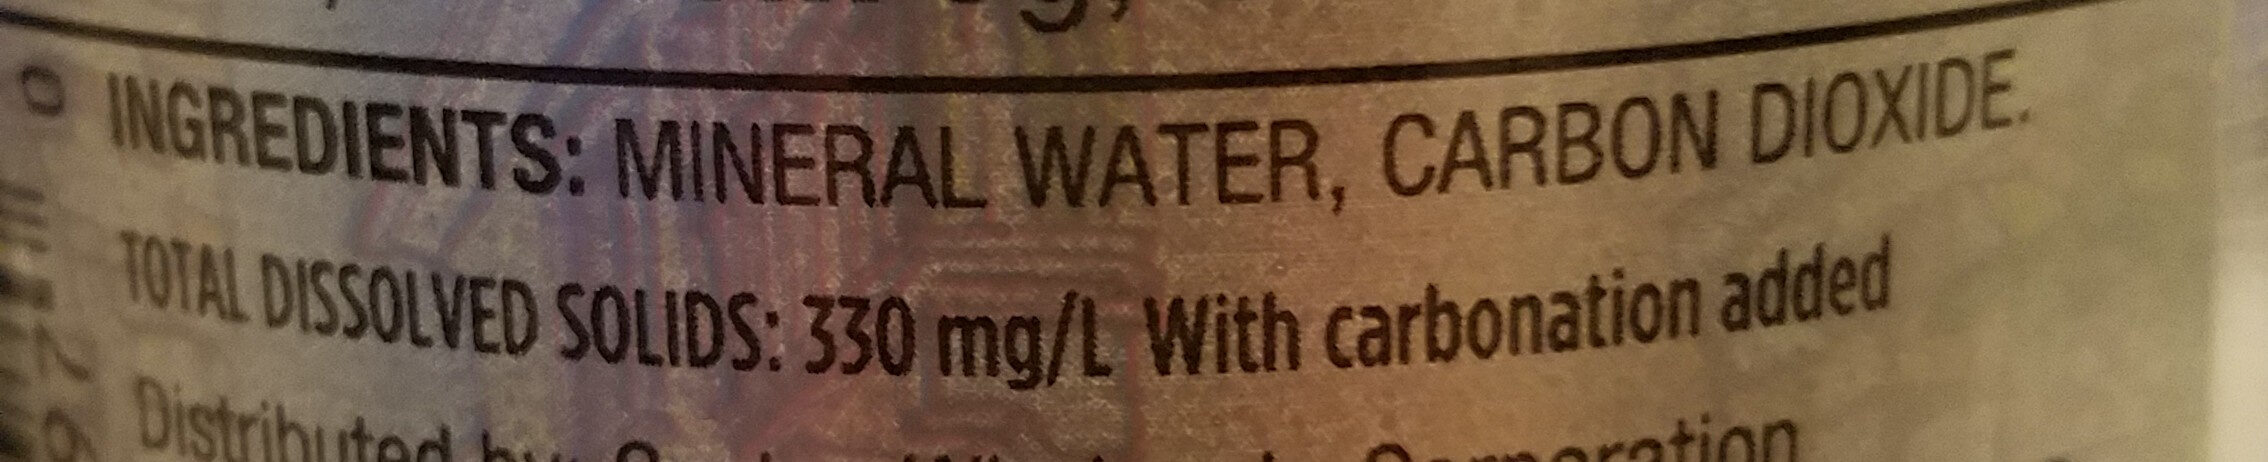 Italian Sparkling Mineral water - Ingrediënten - en